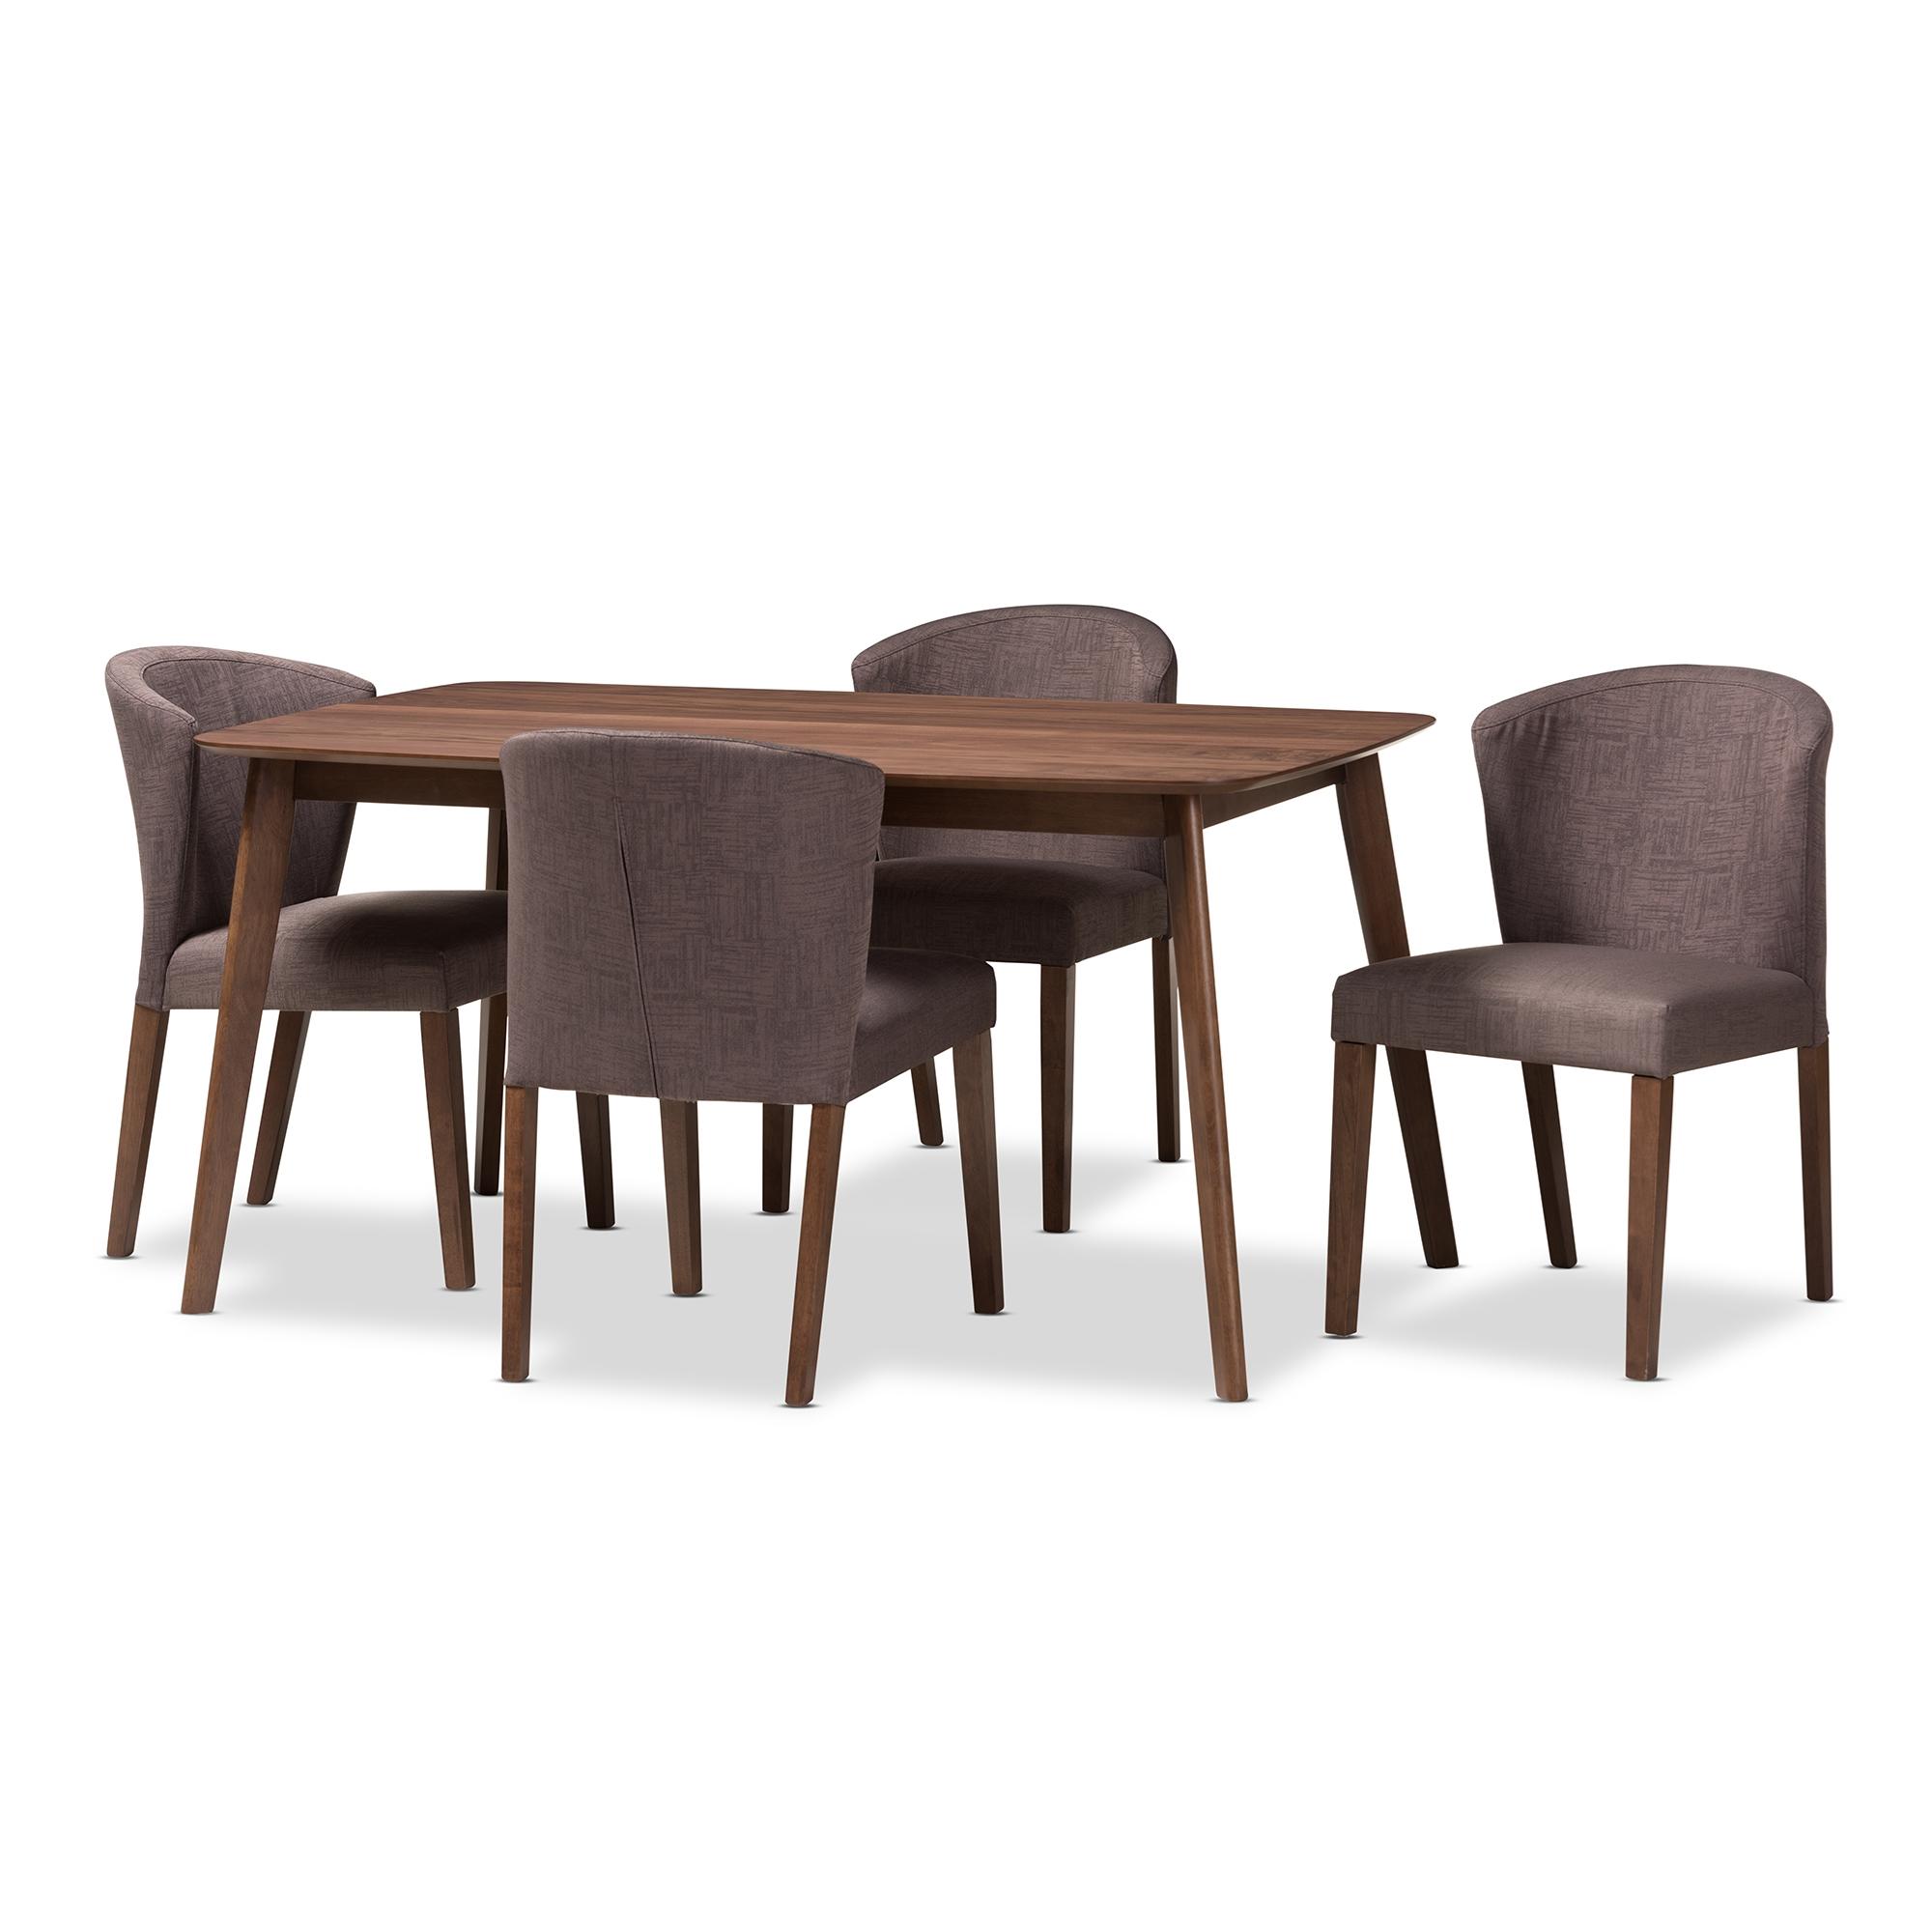 Baxton Studio Cassie Mid Century Modern Walnut Wood Light Brown Fabric  5 Piece Dining Set